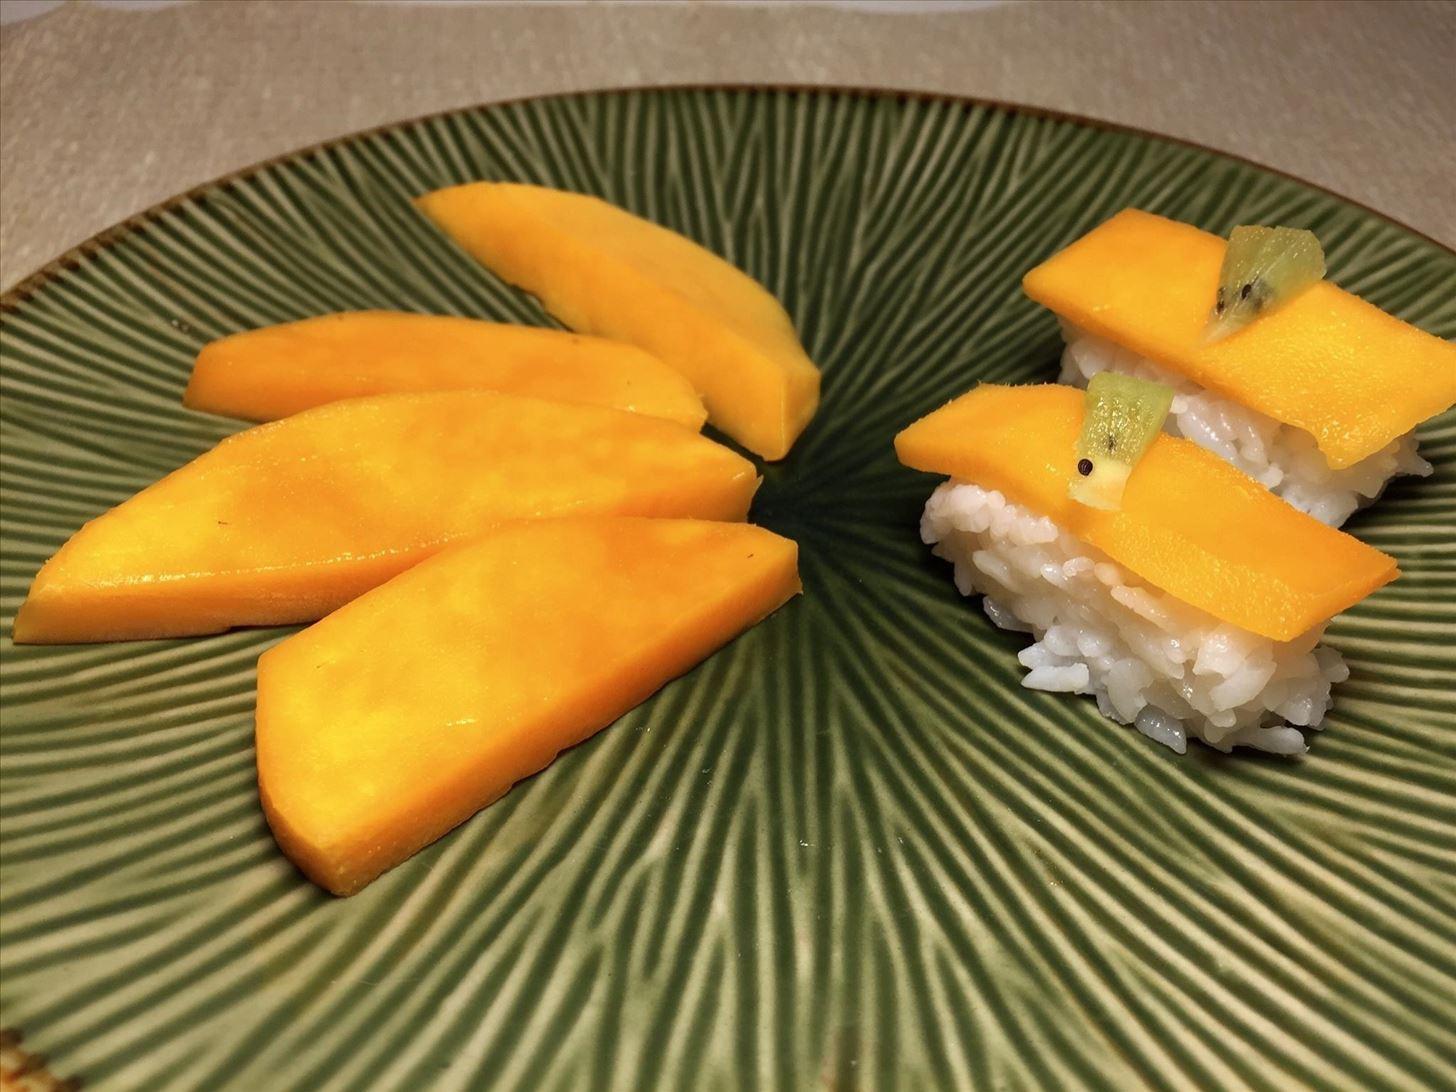 DIY Dessert Sushi: 3 Irresistible, Easy-to-Make Recipes